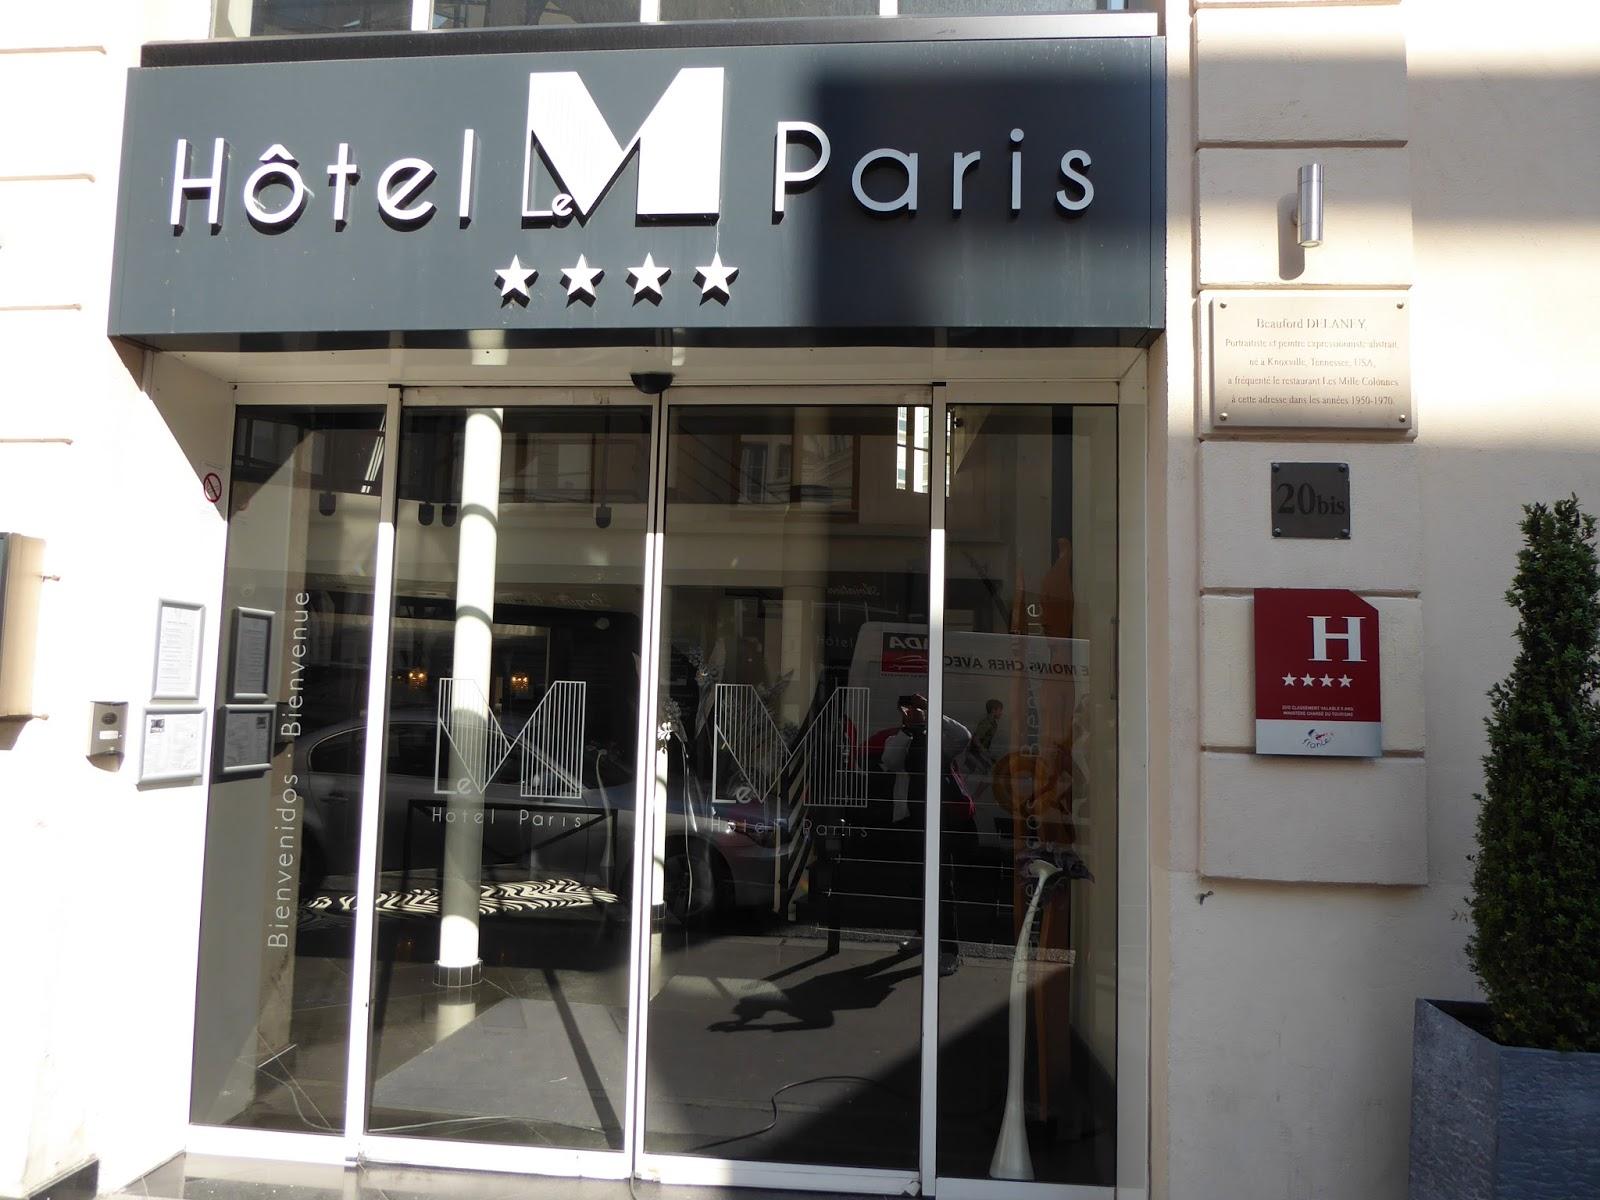 Hotel Edgar Quinet Les Amis De Beauford Delaney Beauford Delaney Plaque Installed At